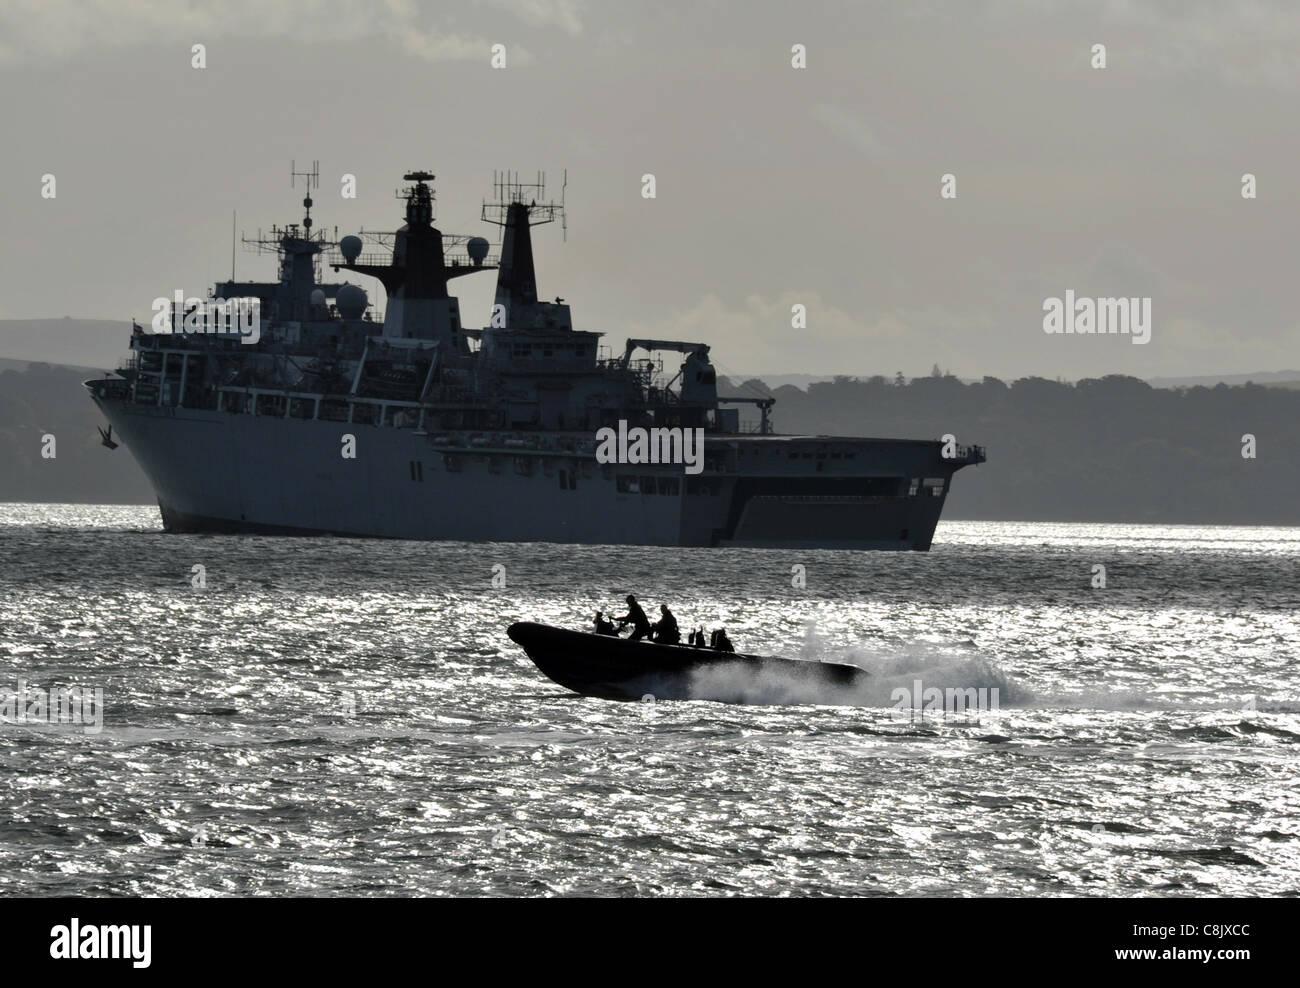 HMS Bulwark (L15) Albion-class landing platform dock, the UK's newest class of amphibious assault warship - Stock Image